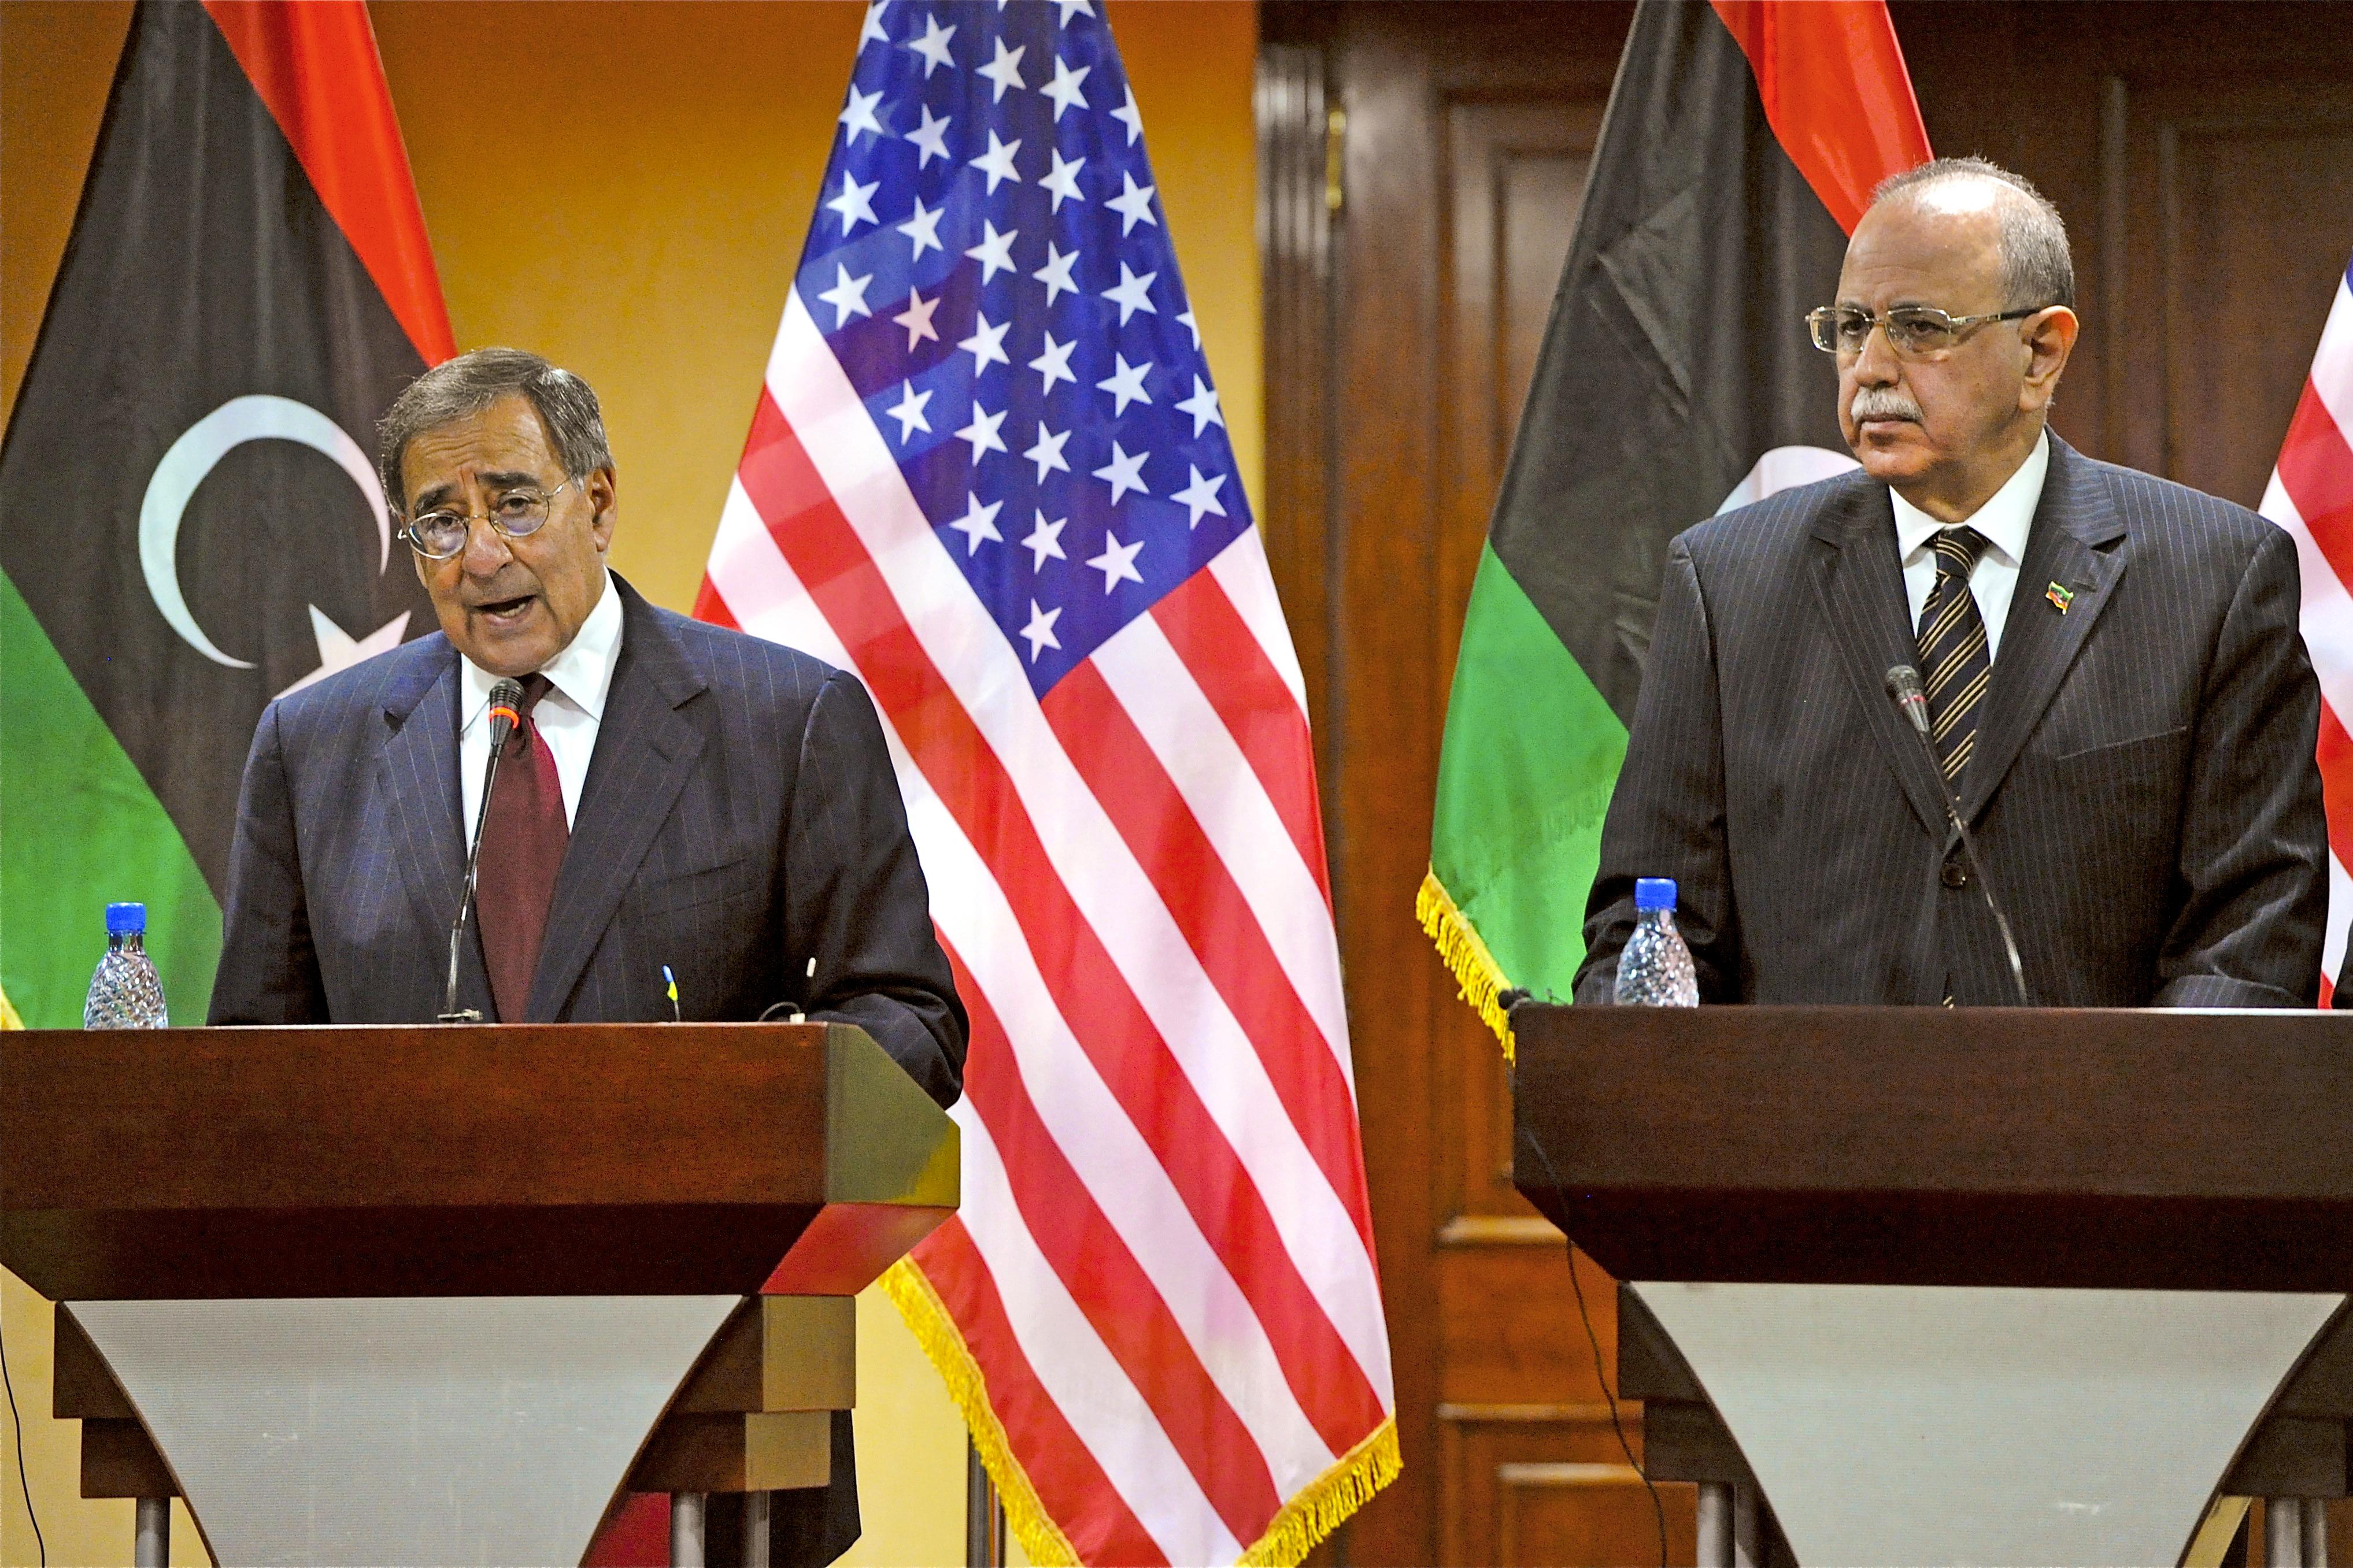 libya background and us relationship